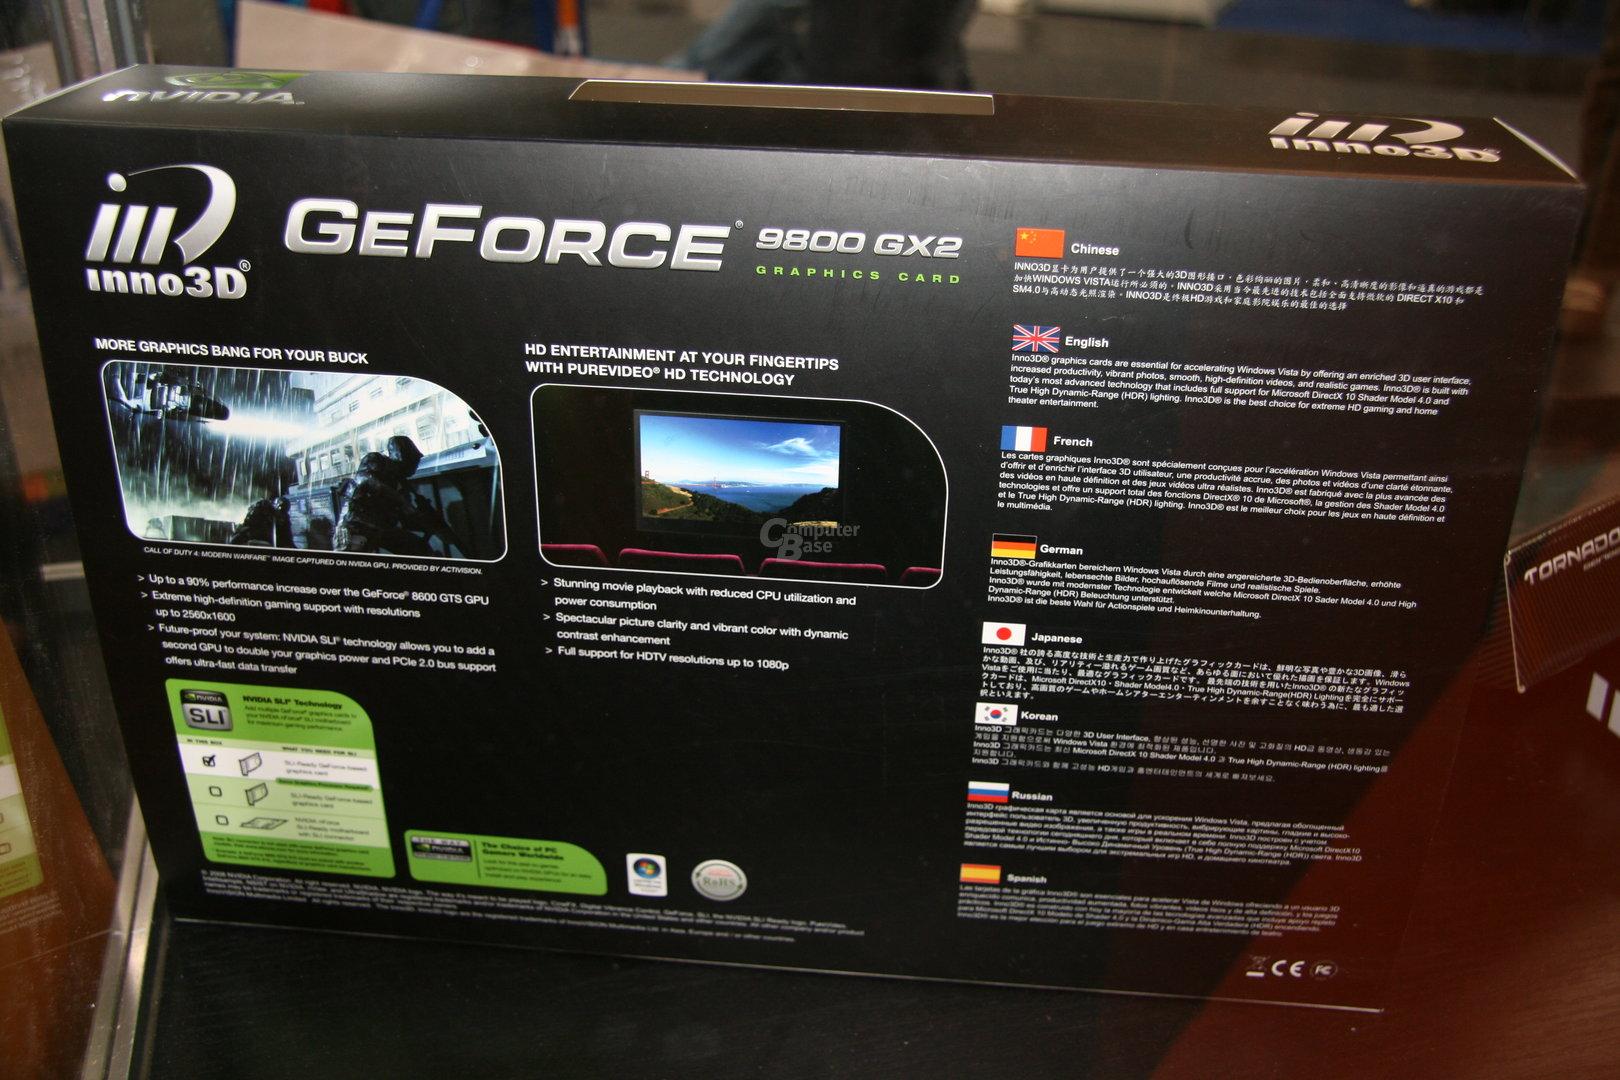 Inno3D GeForce 9800 GX2